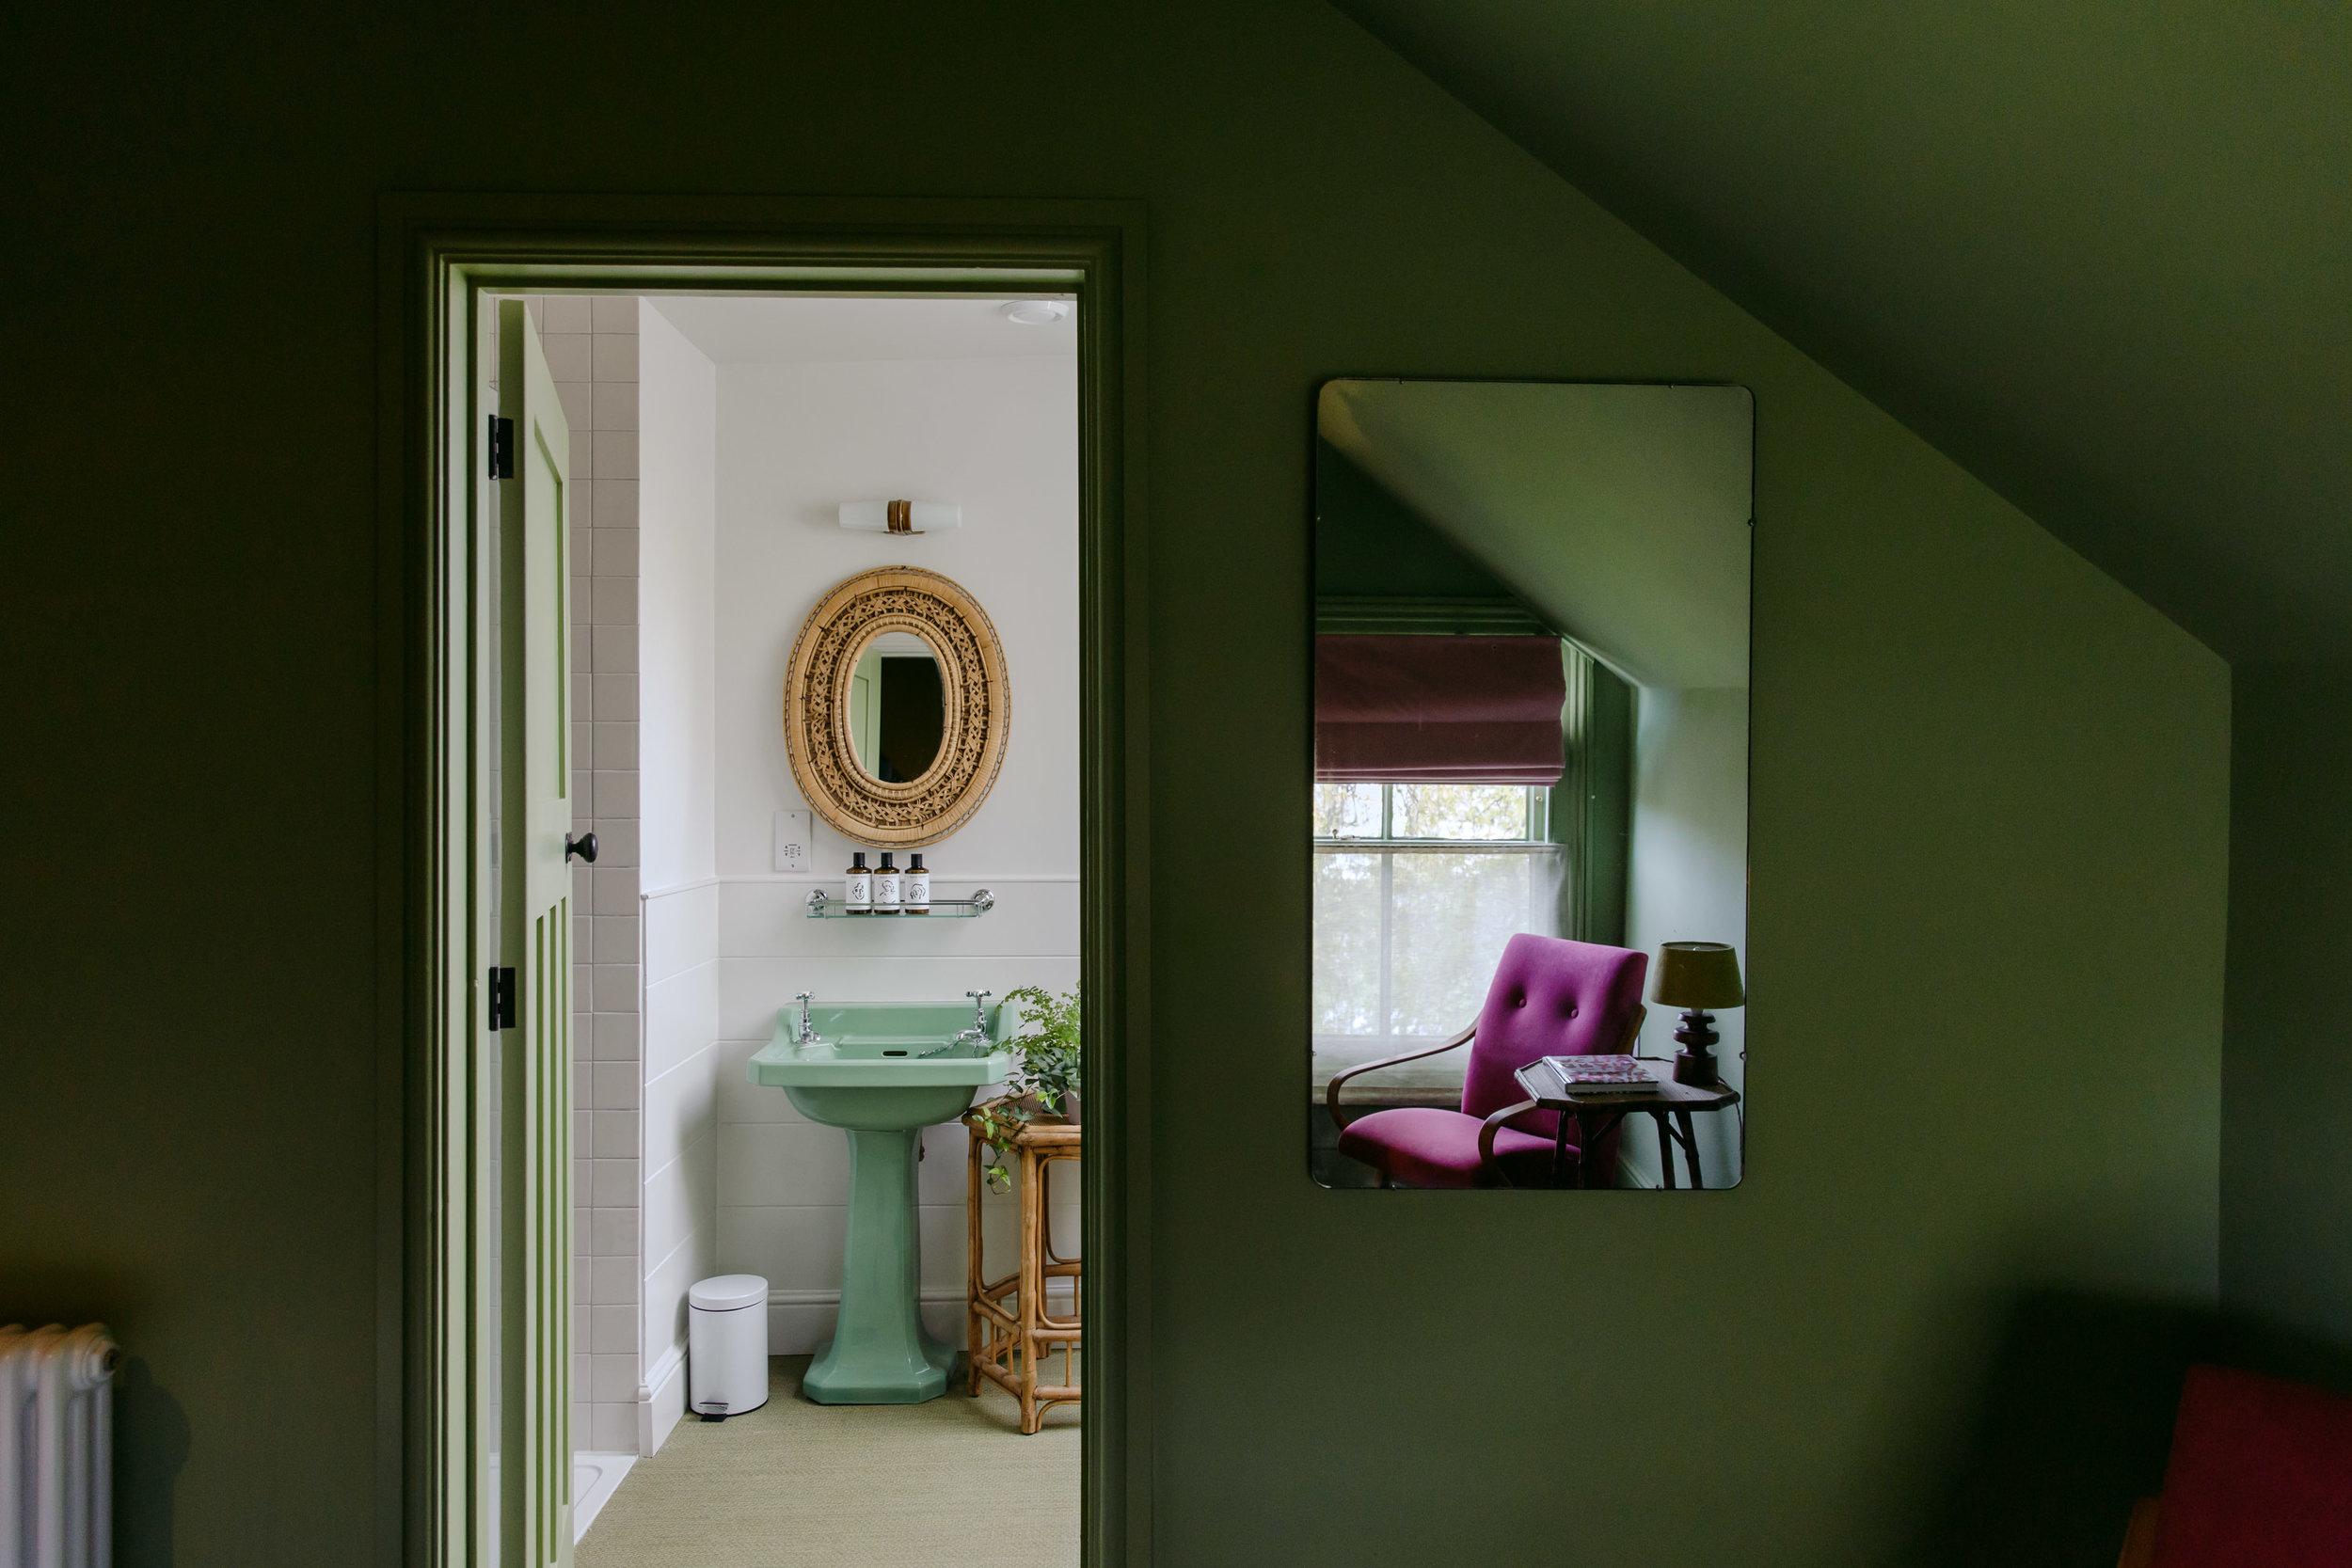 deal-hotel-the-rose-kent-coast-interior-design-support-local-magazine-styling-refurb-1-6002.jpg